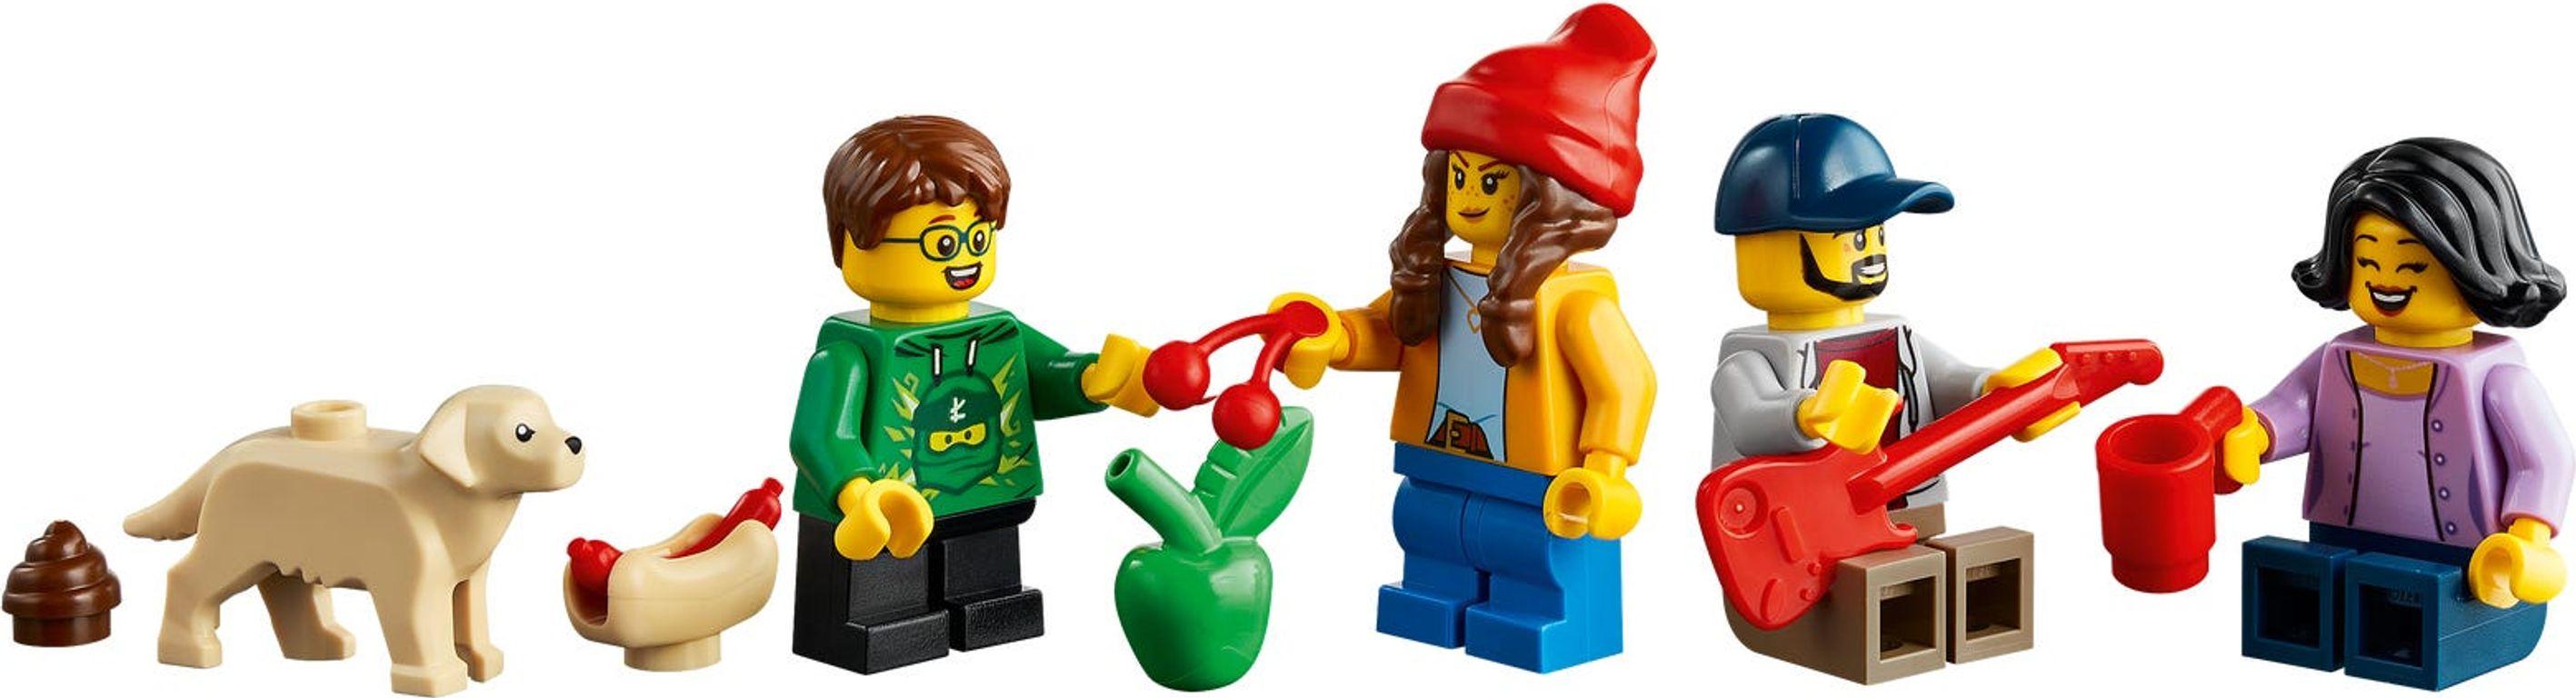 LEGO® City Family House minifigures